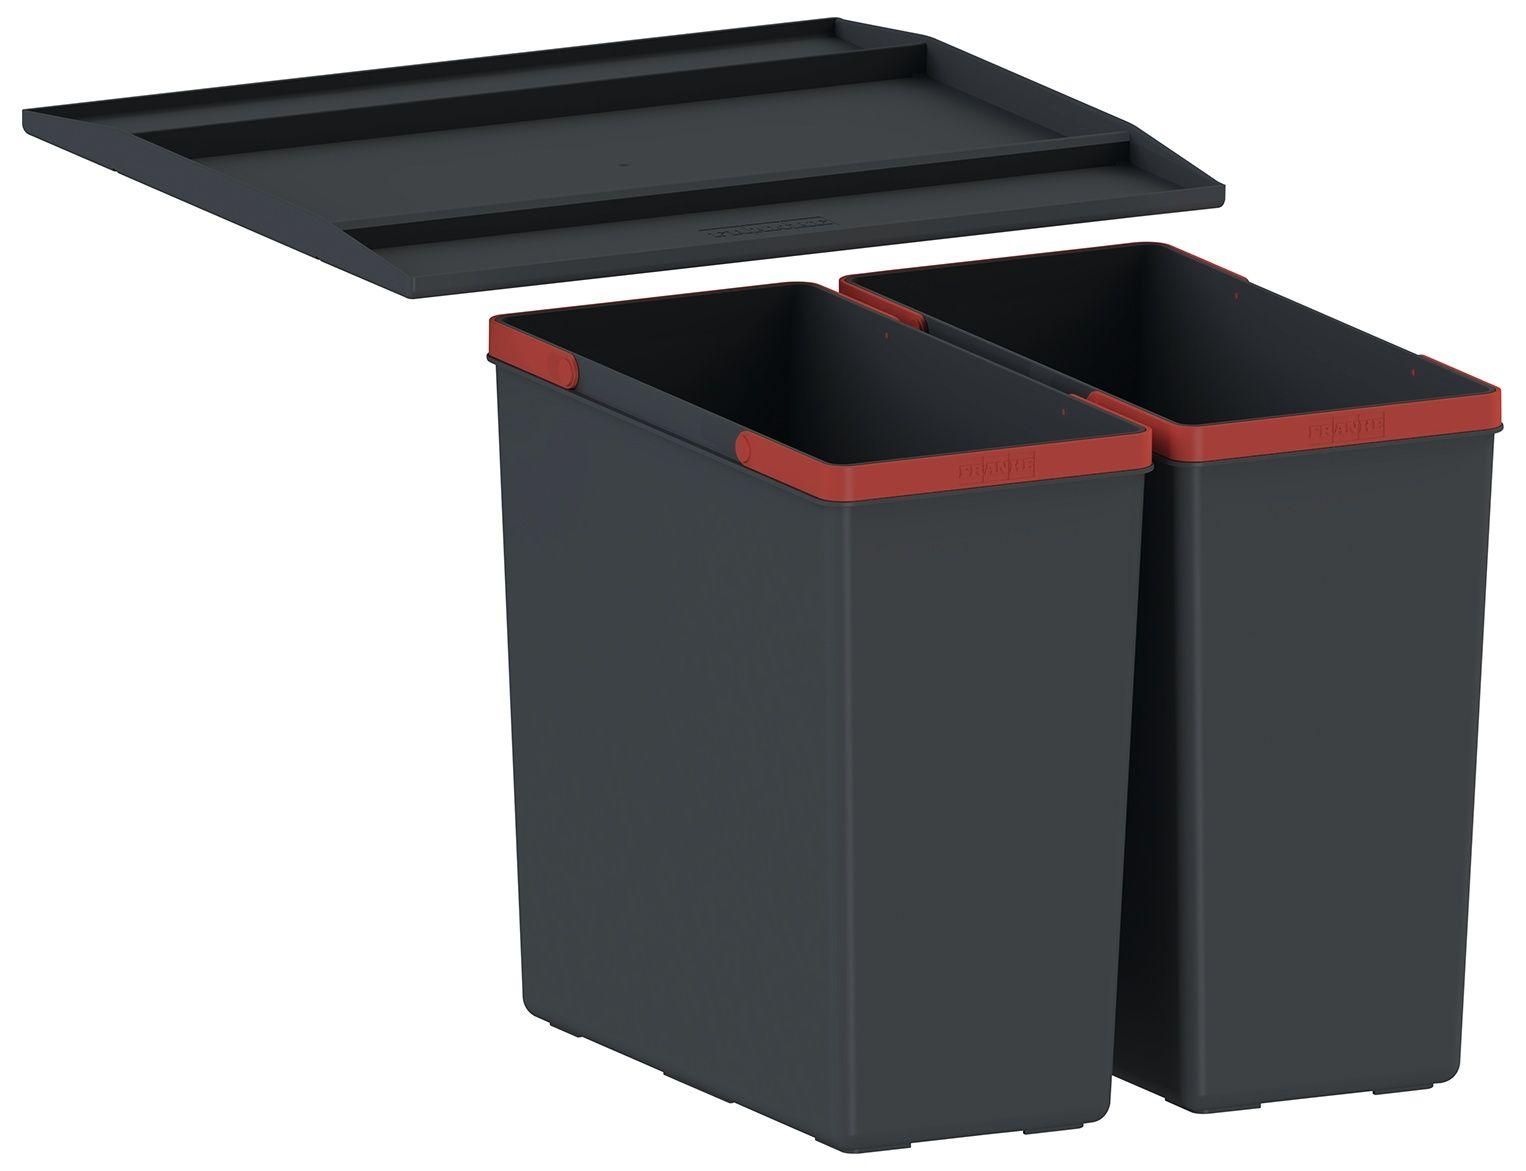 Odpadkový koš Franke Sorter EasySort 450-2-0, 2x 14,5 l